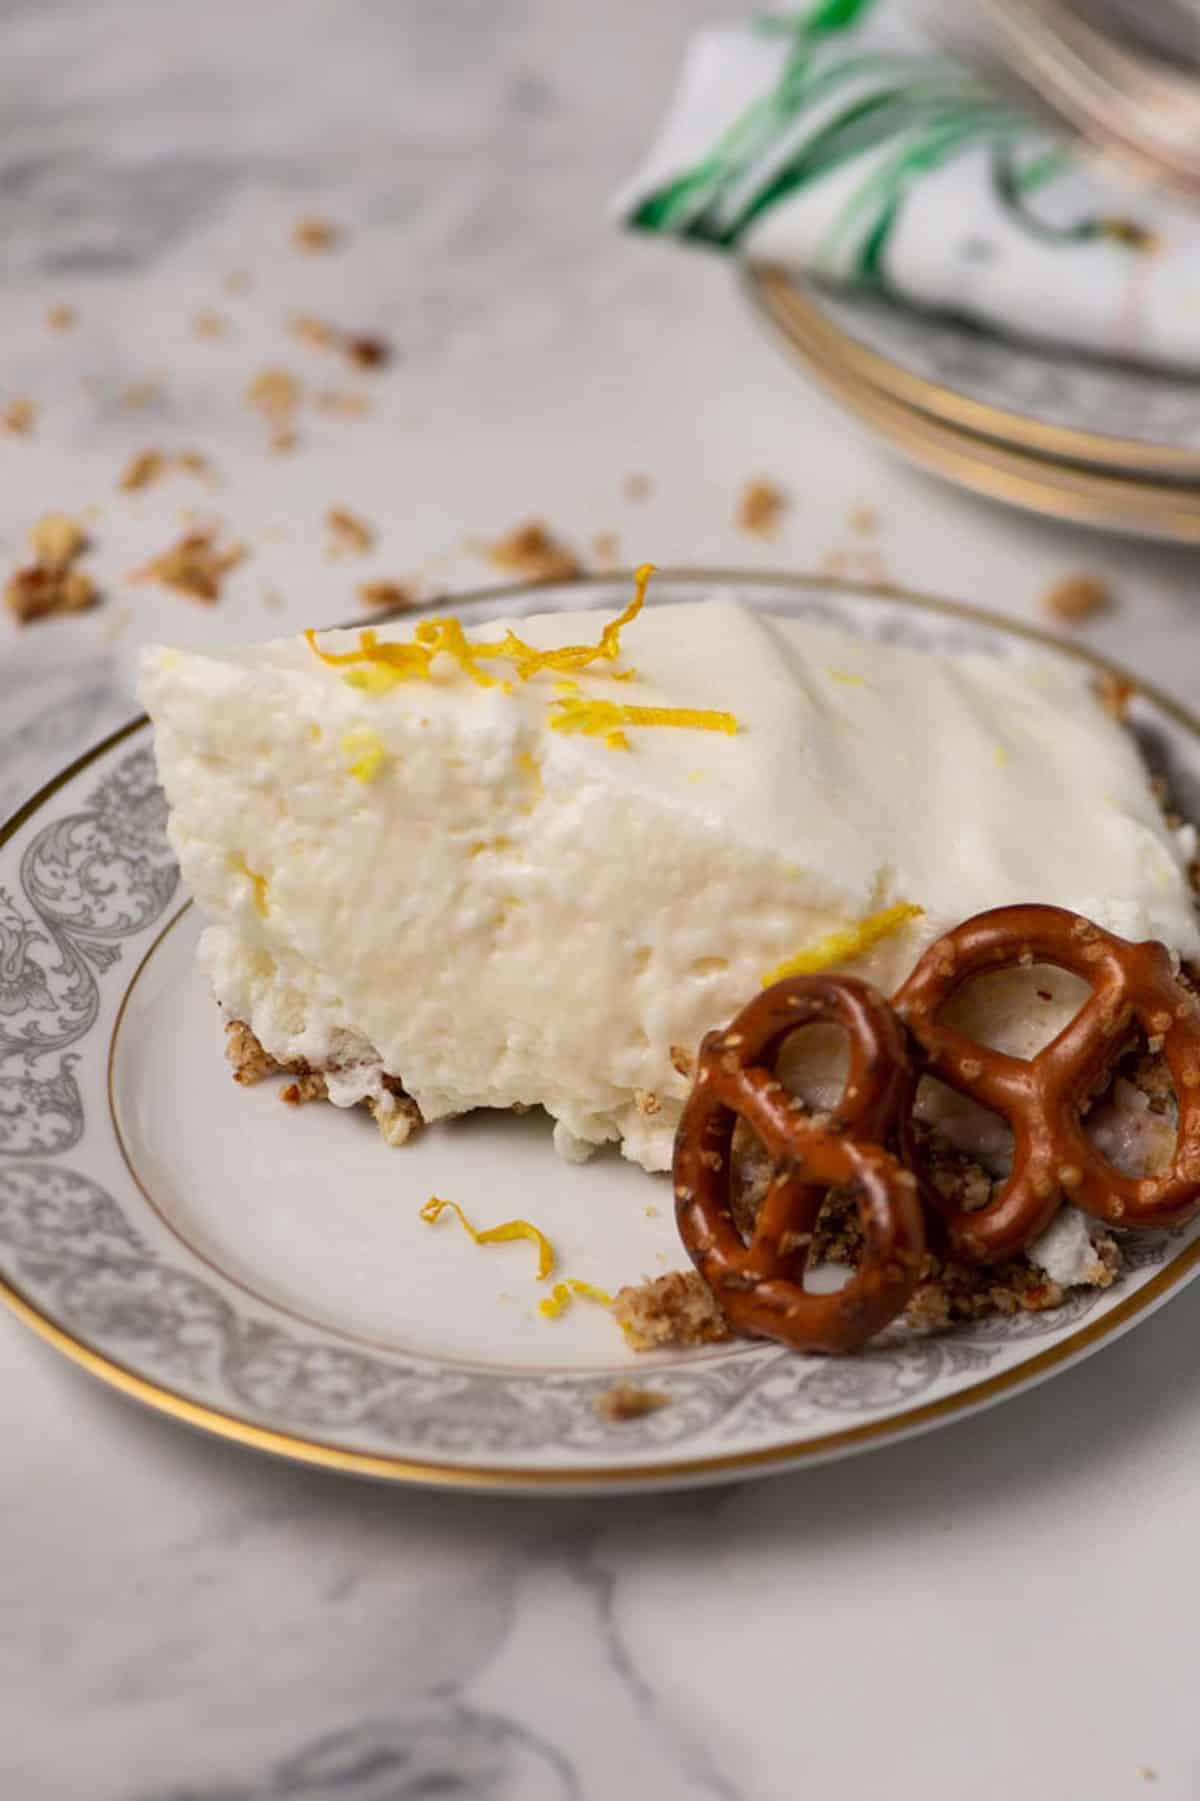 A slice of lemon chiffon pie with pretzels on a china plate.